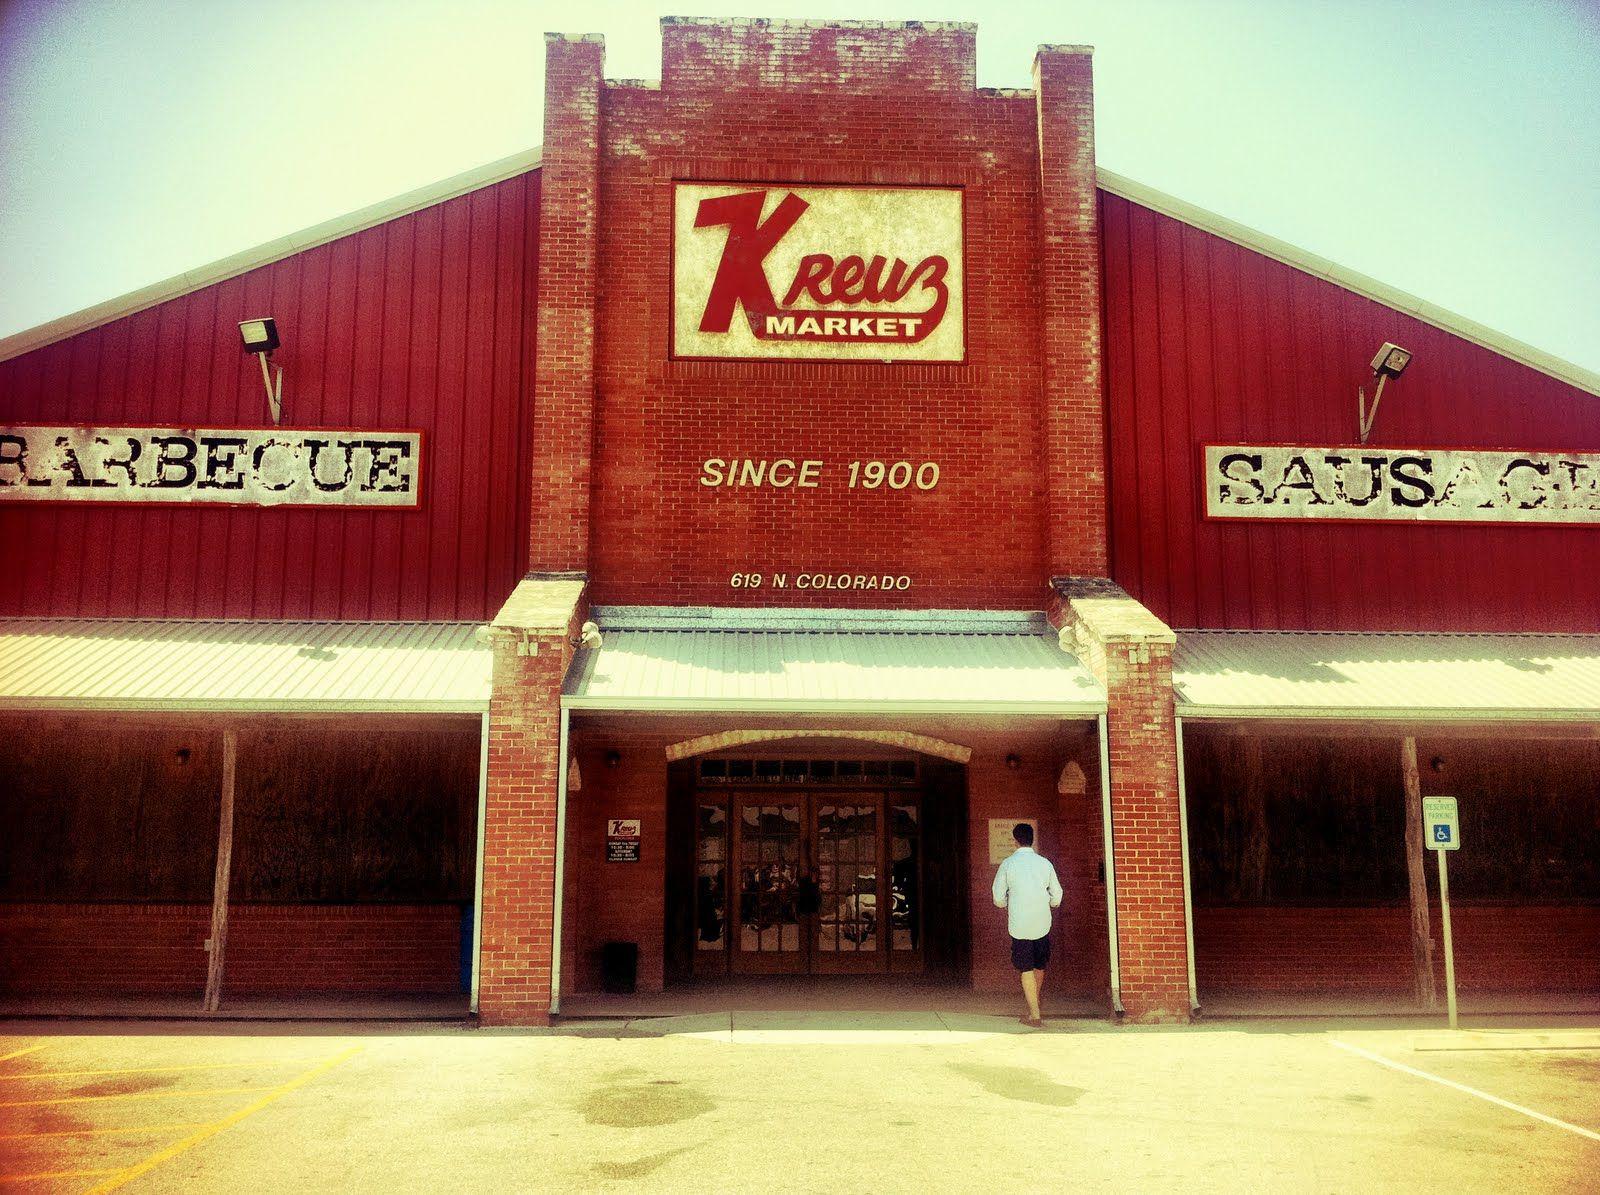 Lockhart Texas Bbq Mecca Now Yer Texan Or German If You Can Pronounce It Kroytz Texas Bbq Bbq Places Bbq Joint